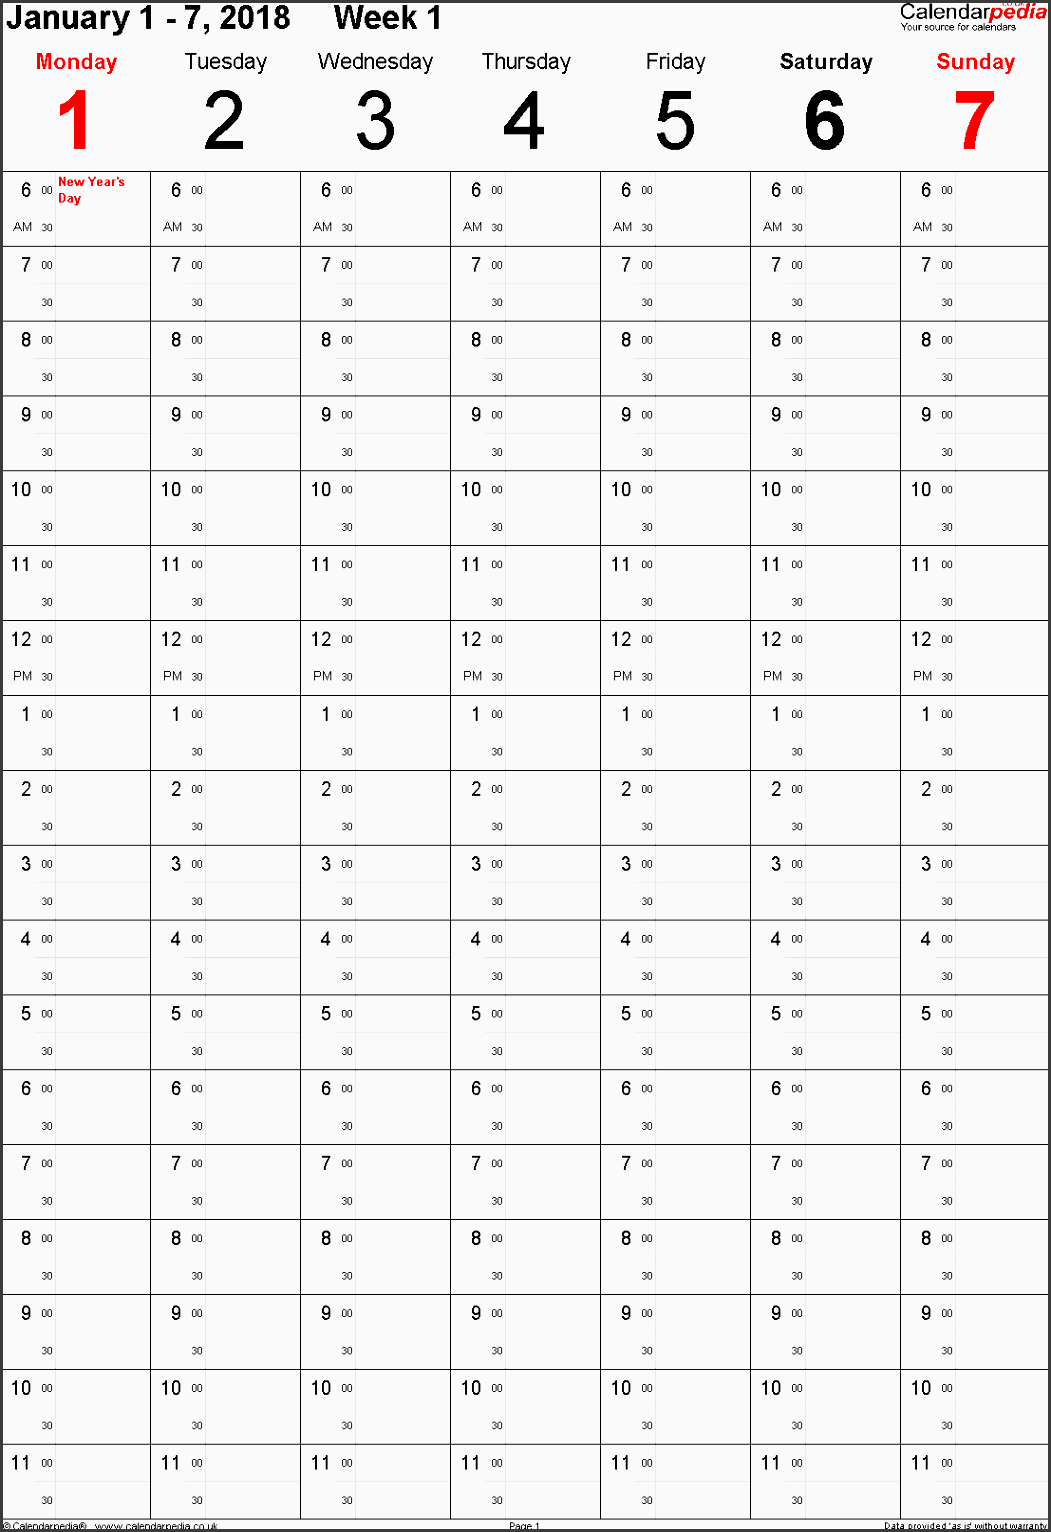 word template 8 weekly calendar 2018 portrait orientation 53 pages 1 calendar